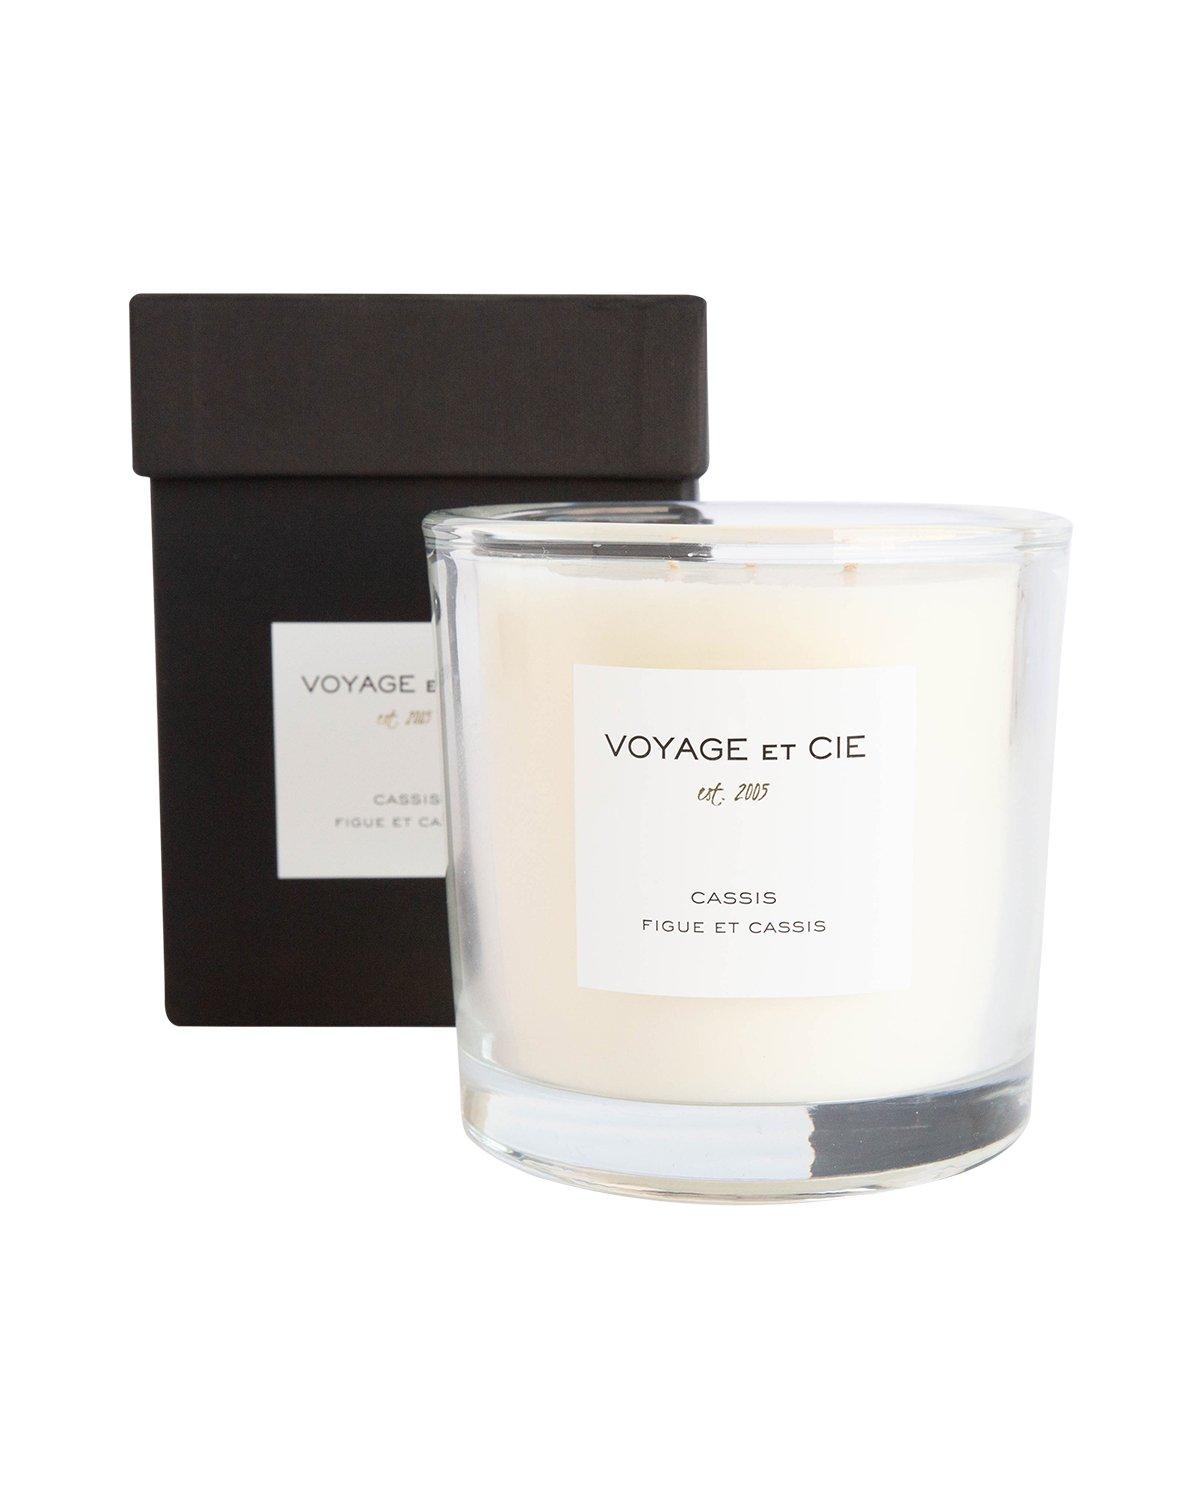 Voyage_et_Cie_3-Wick_Candle_3.jpg